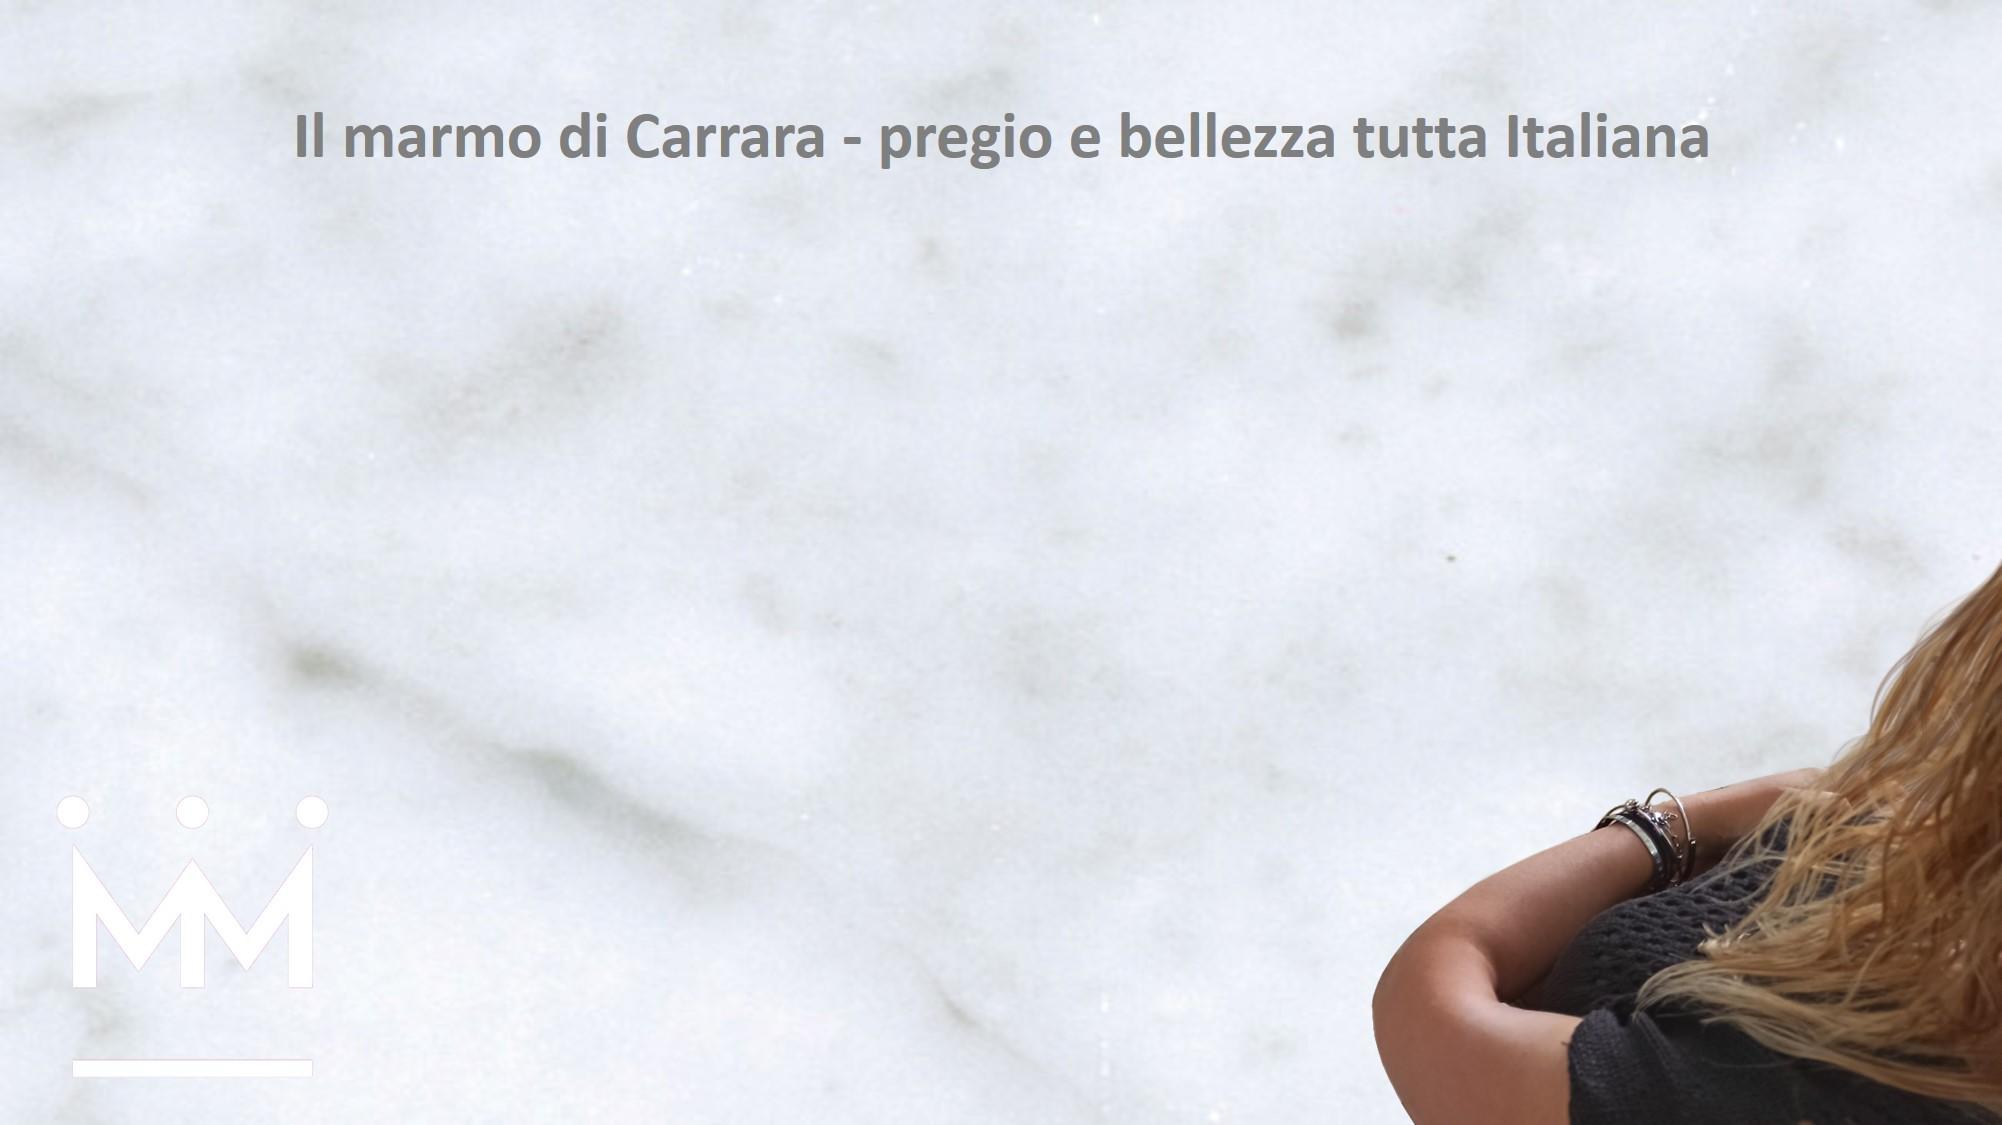 Carrara marble – Italian quality and beauty